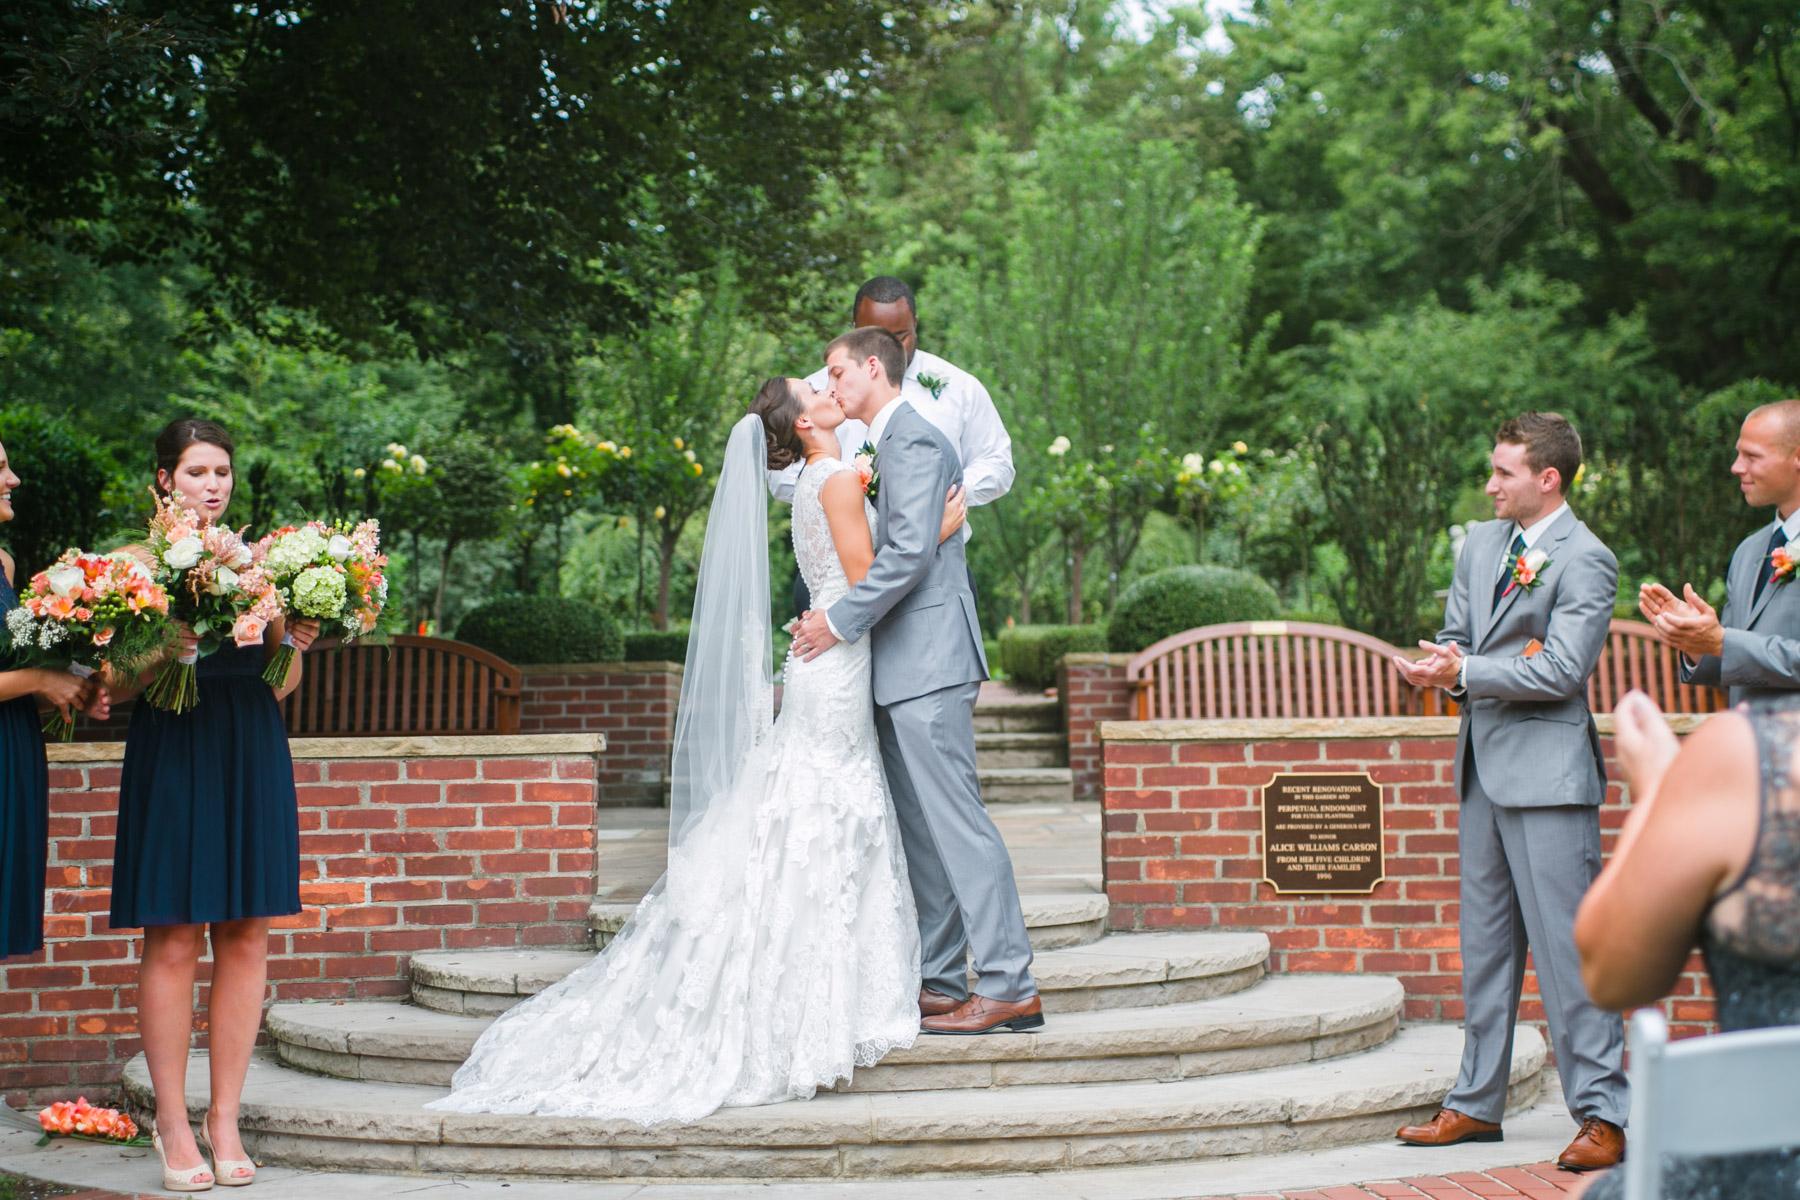 wildwood-park-wedding-photos-34.jpg